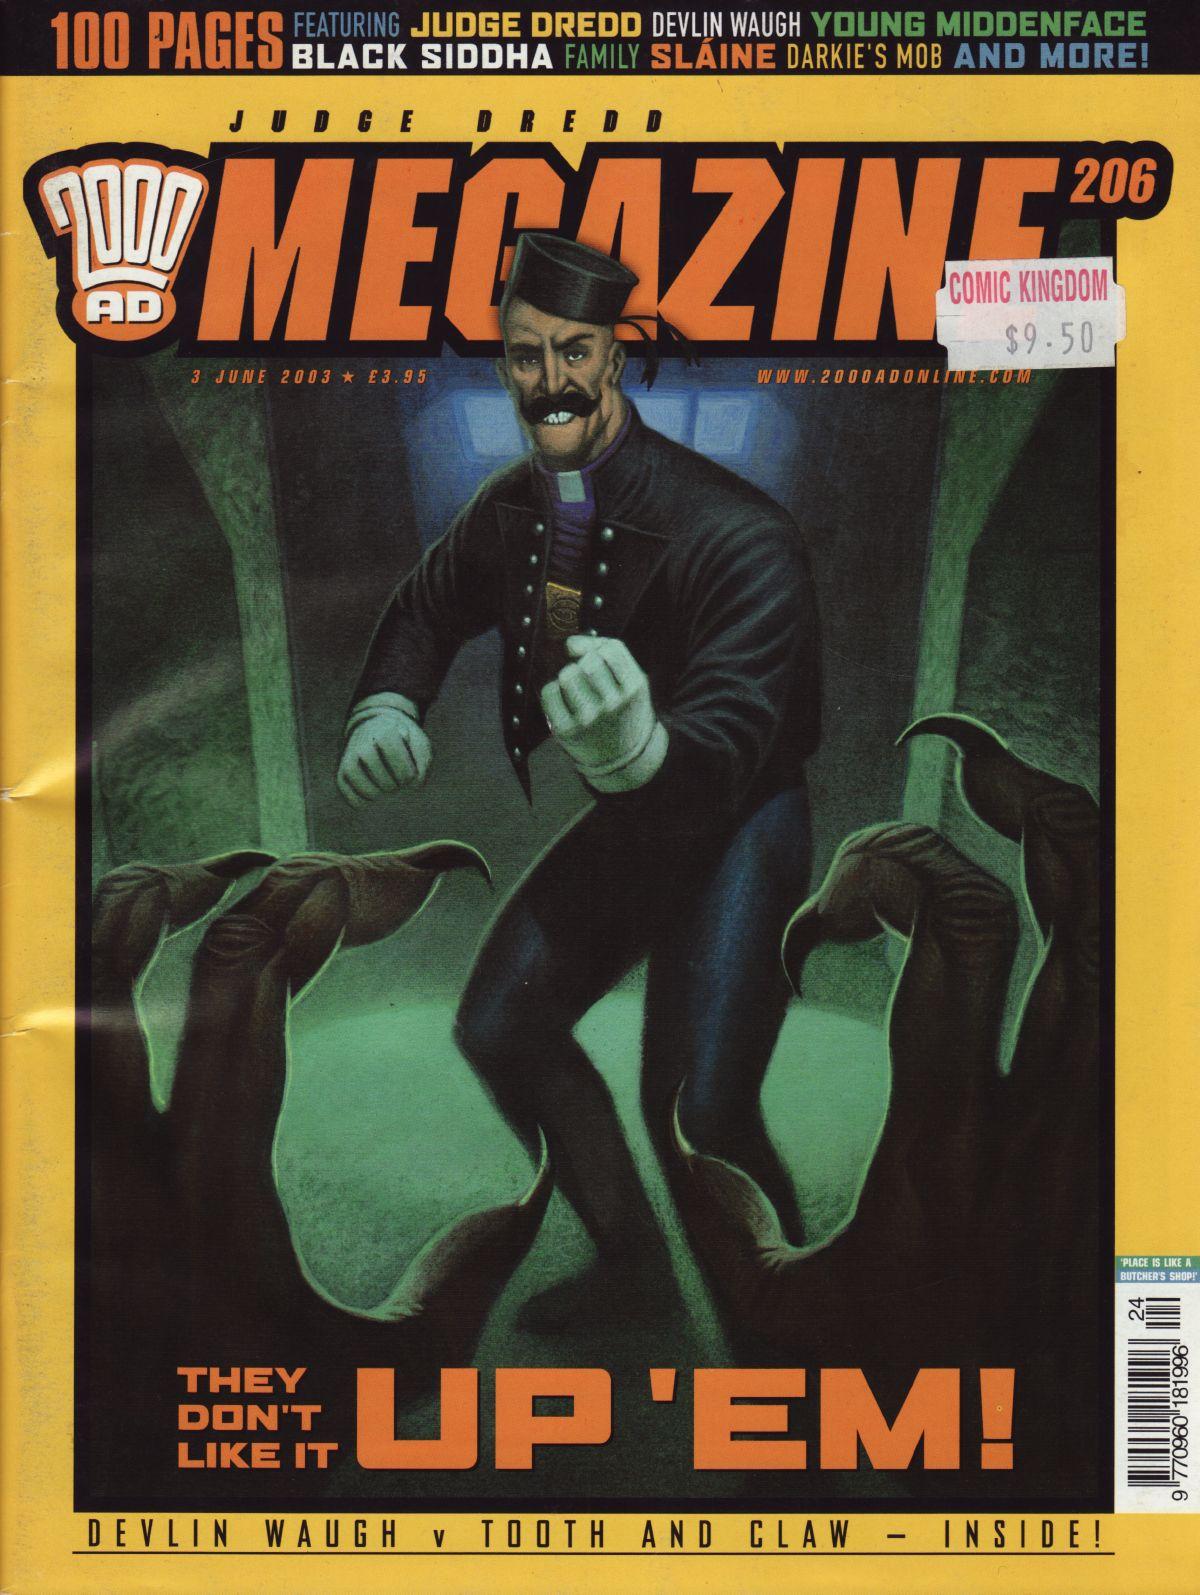 Judge Dredd Megazine (Vol. 5) issue 206 - Page 1